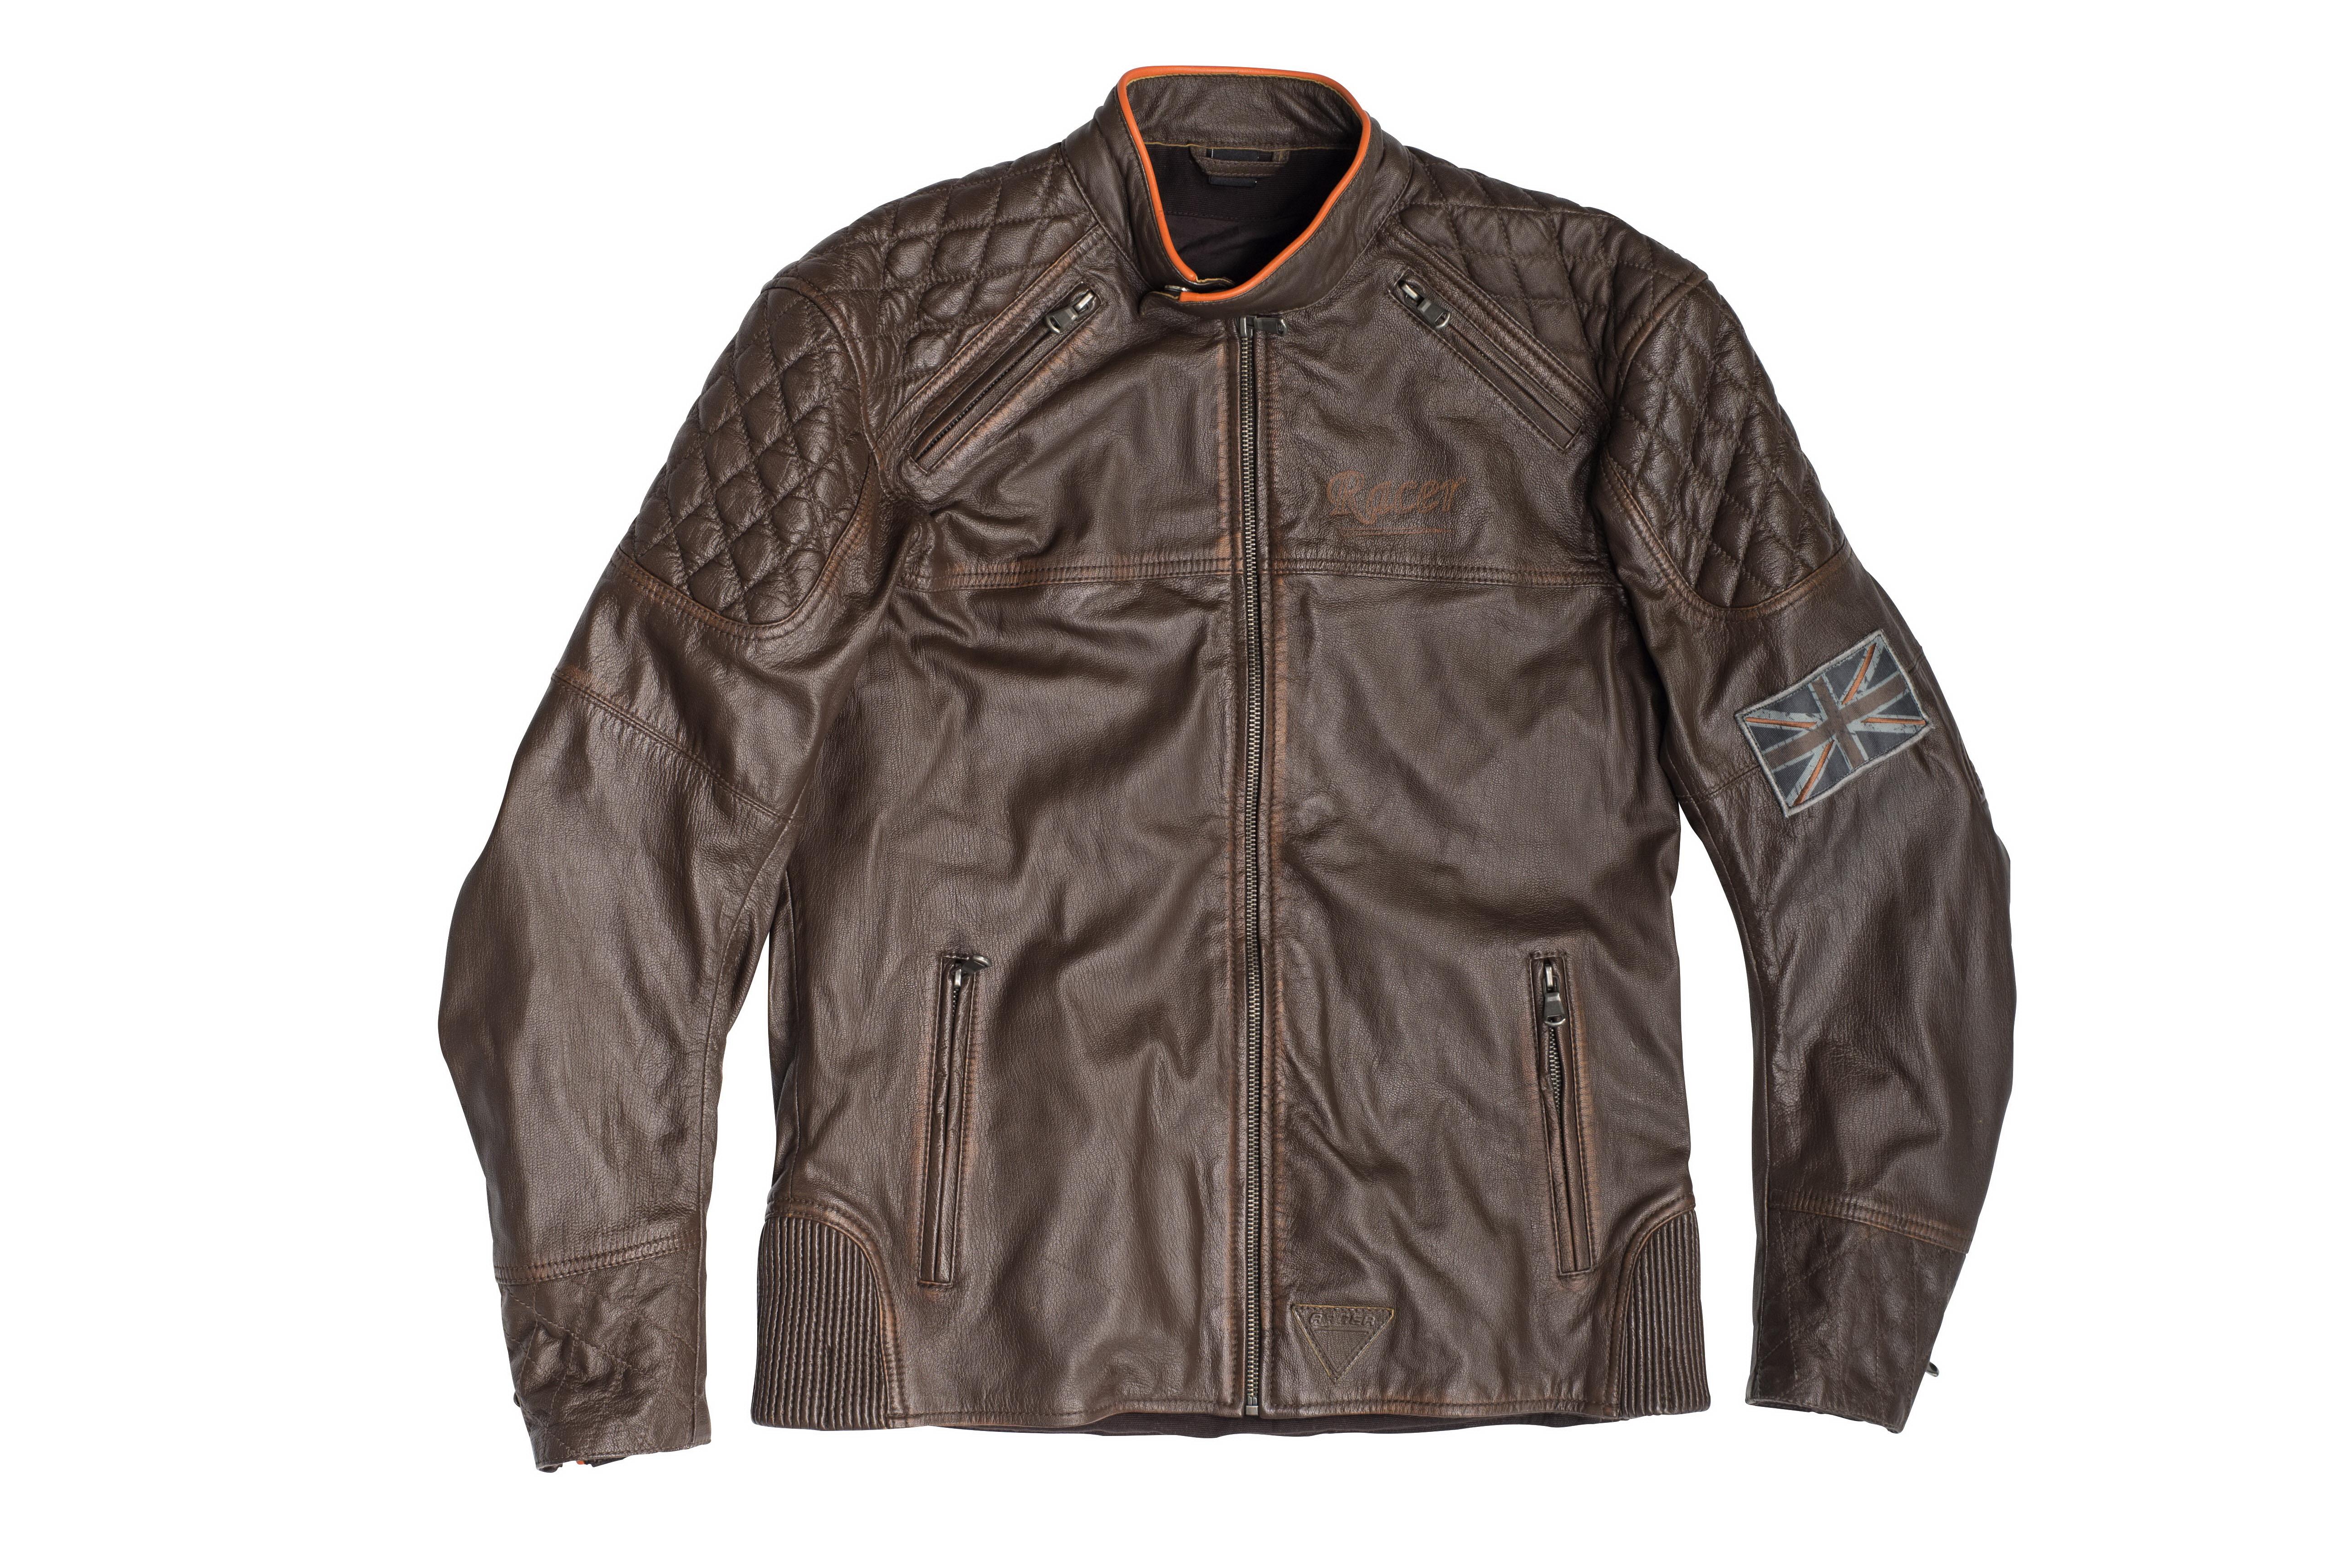 Recer Scrambler Jacket